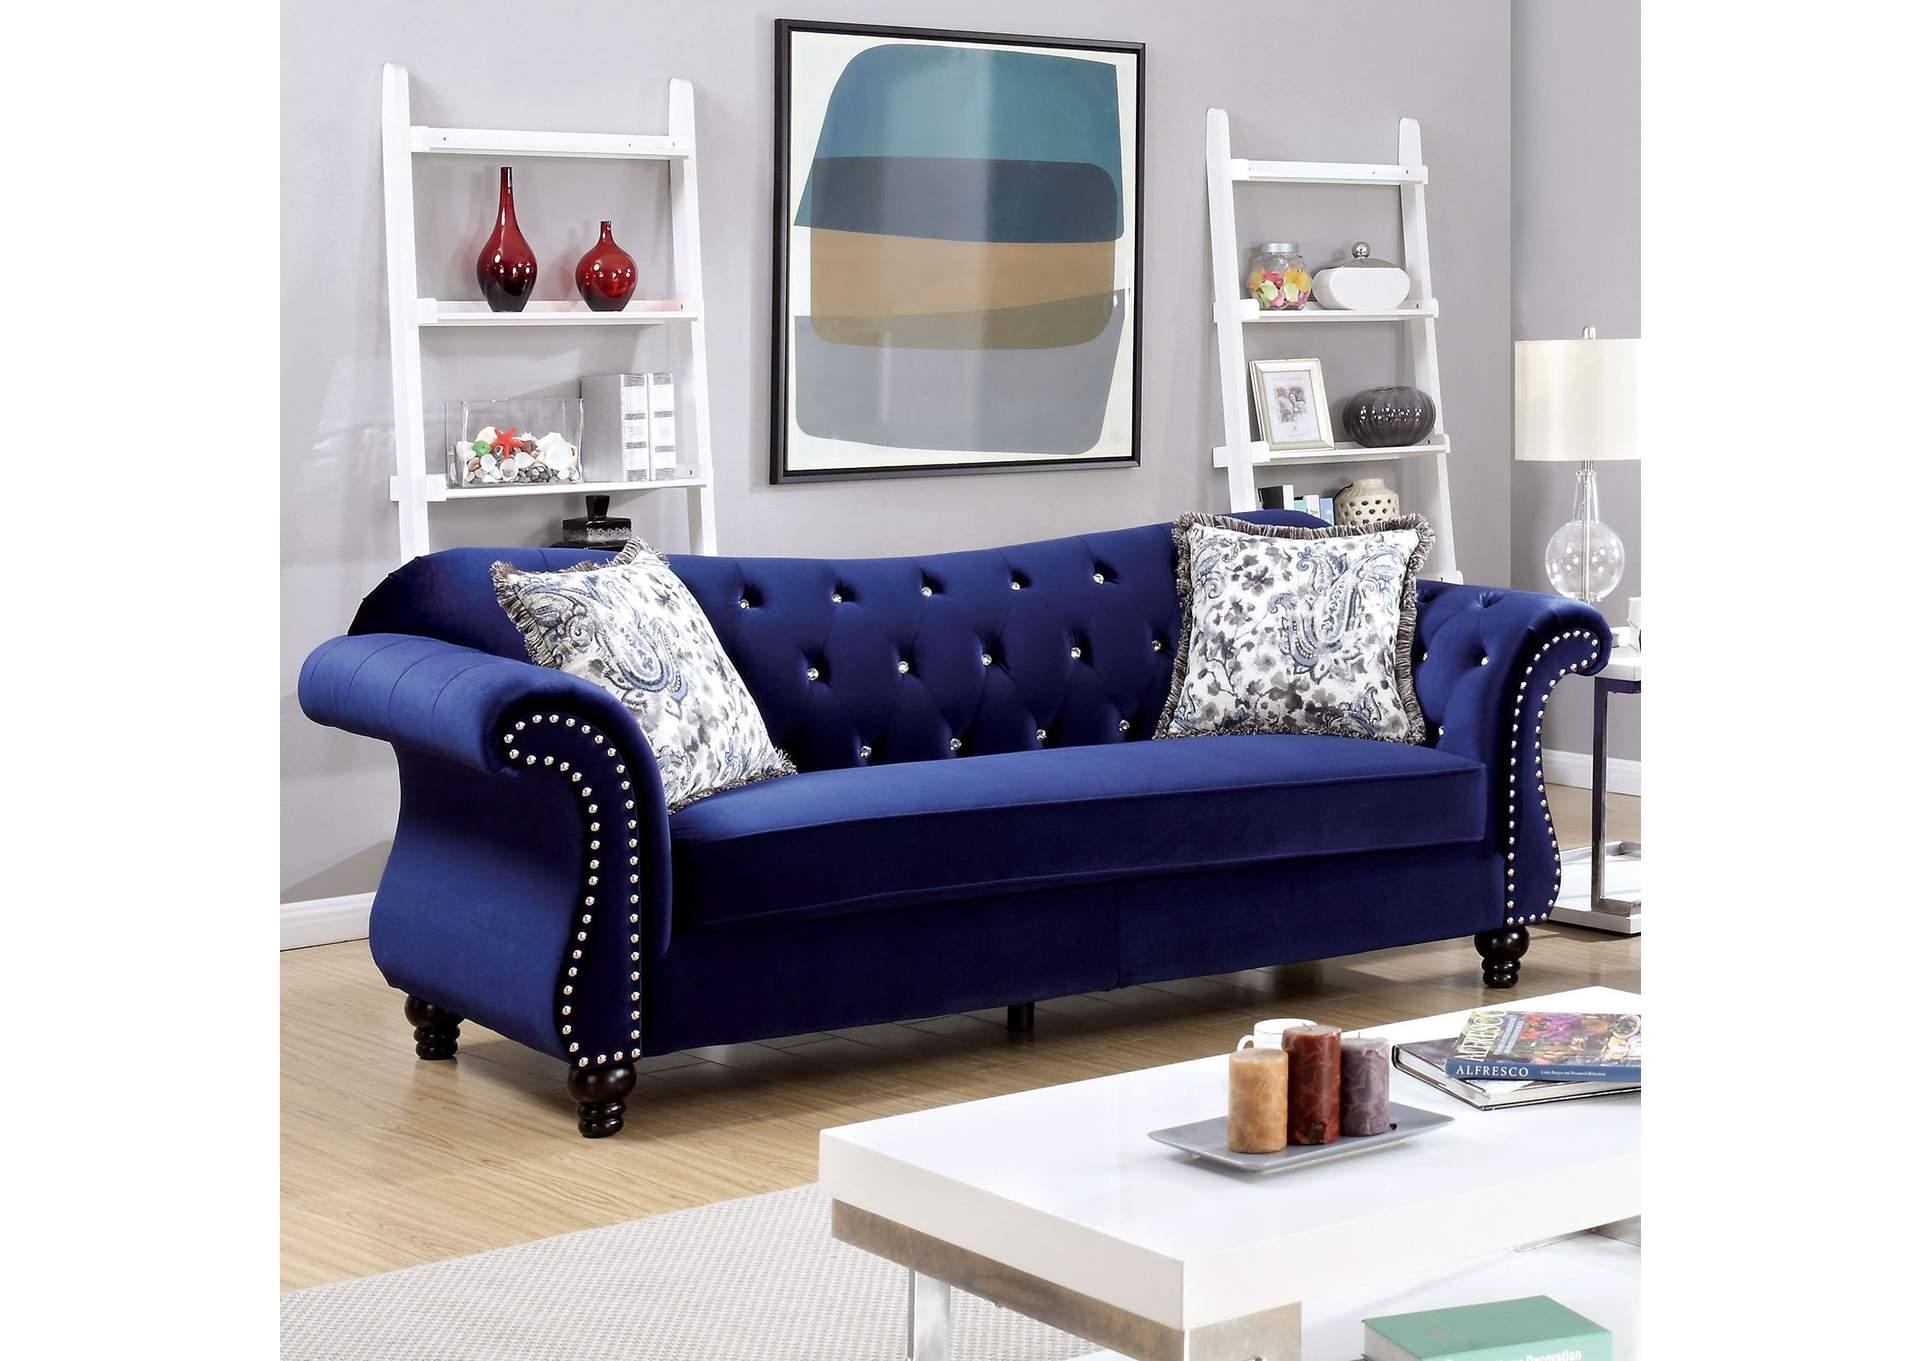 Long island discount furniture jolanda blue curved back sofa for Living room furniture long island